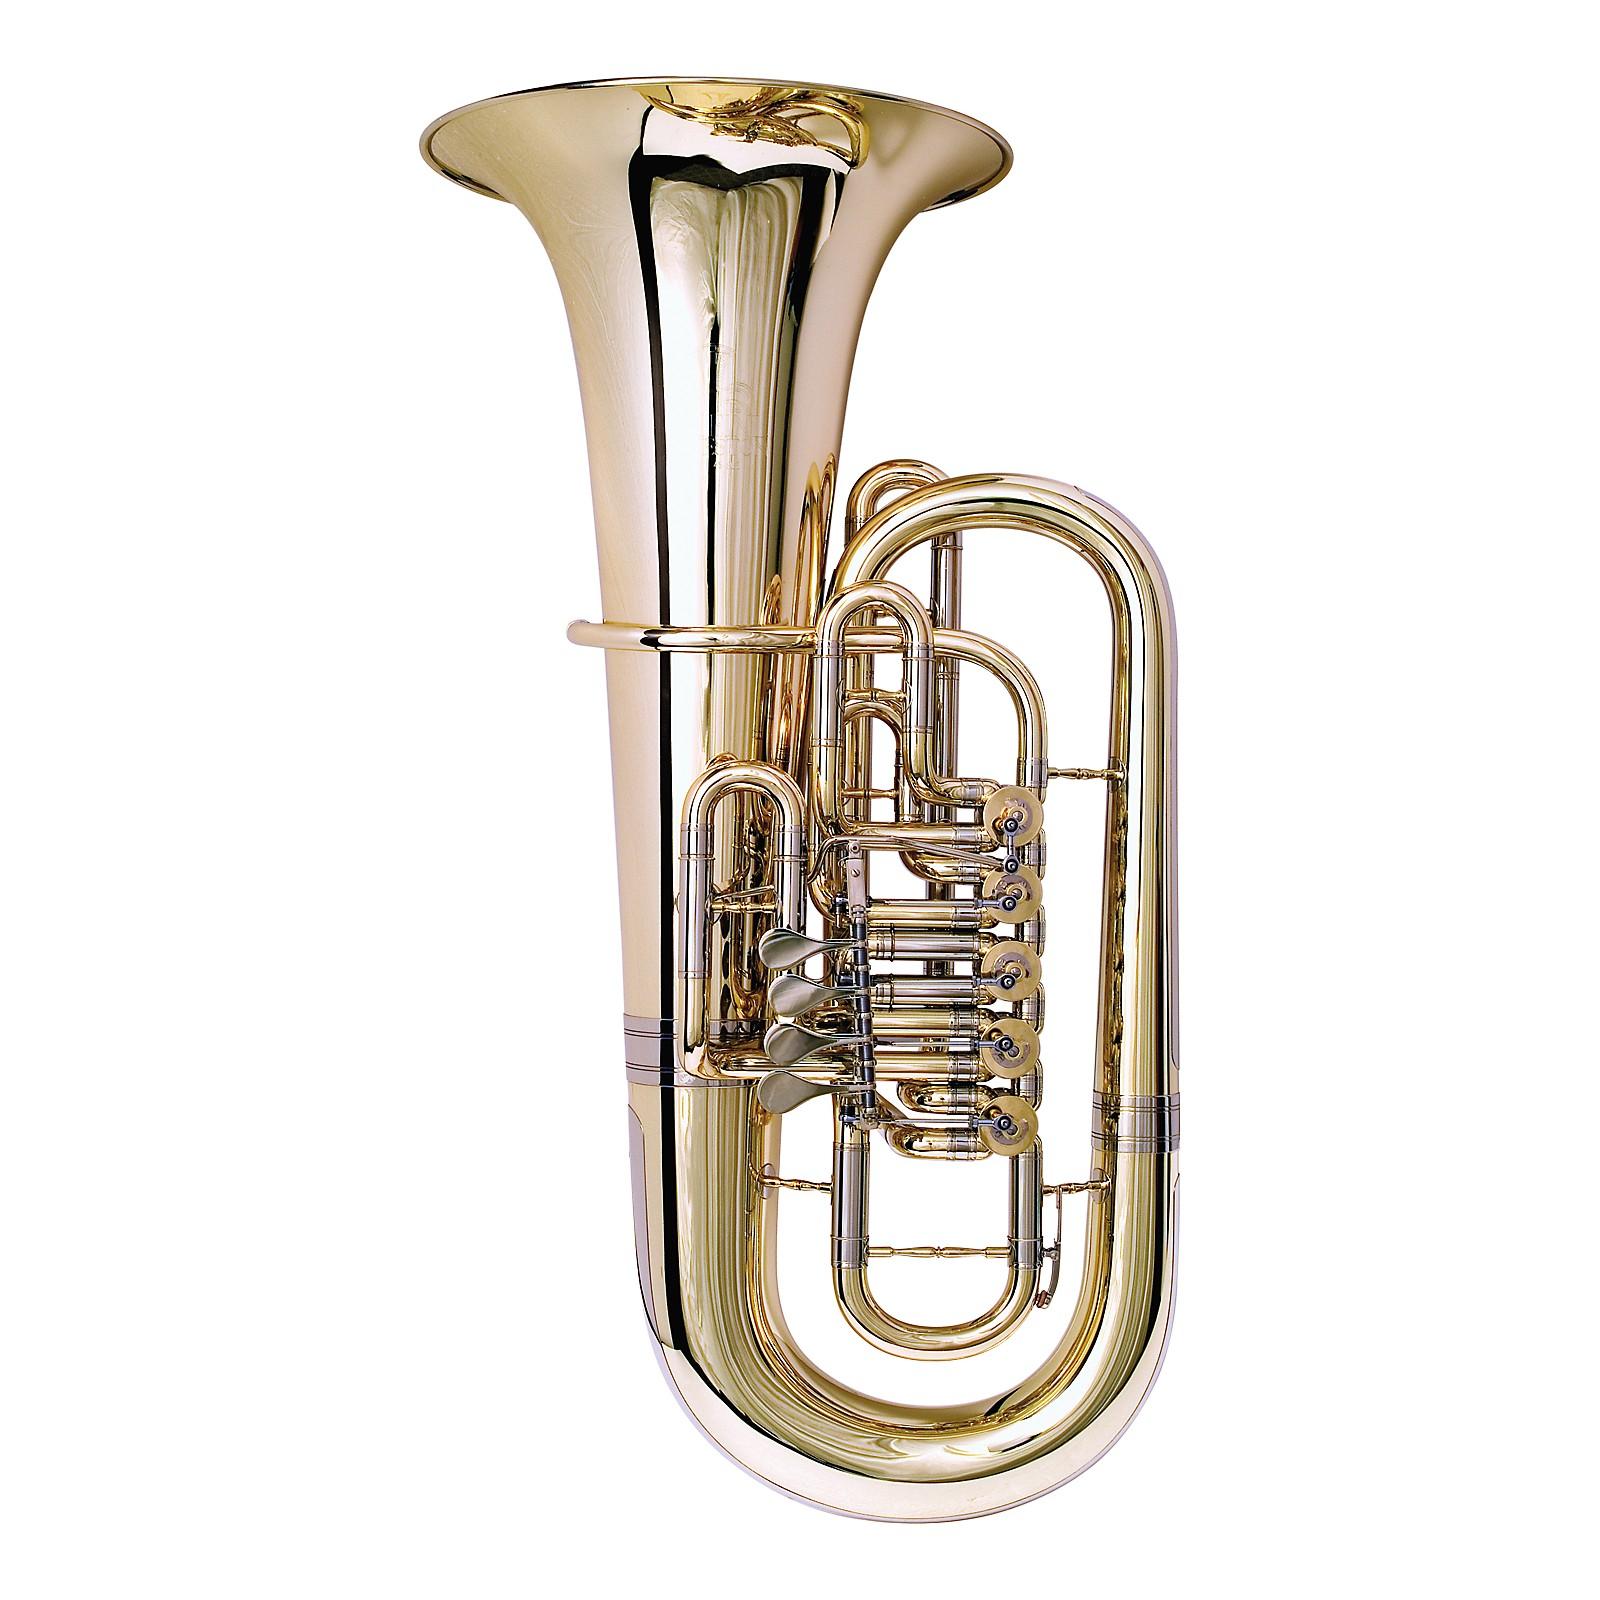 Meinl Weston 45 SLZ 6/4 5 Rotary Valve F Tuba